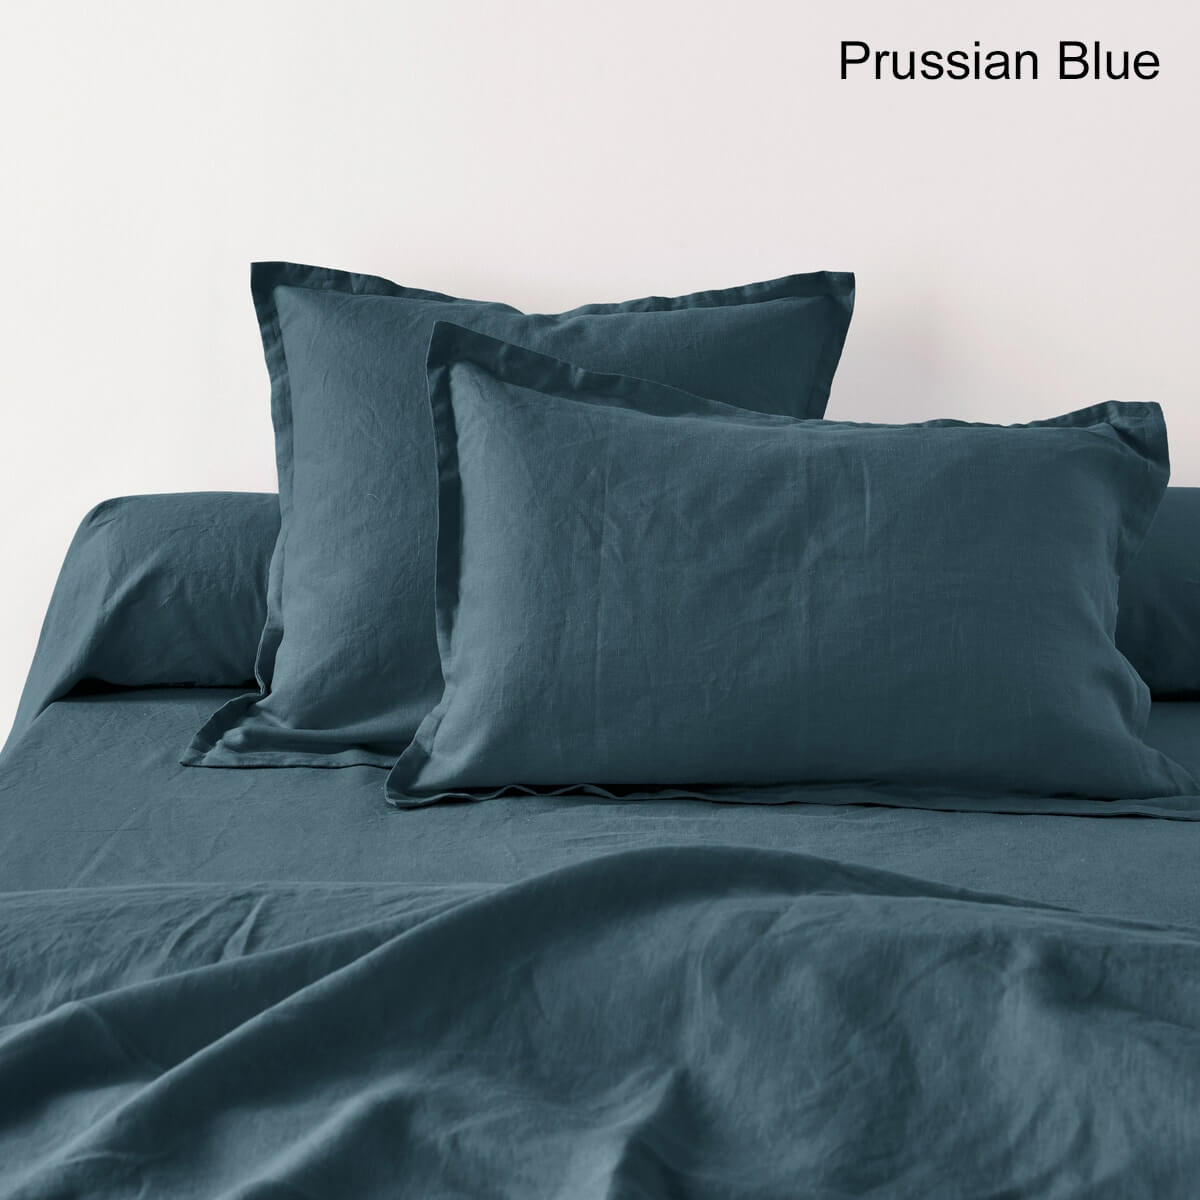 Washed Linen Plain Pillowcase or Bolster Case